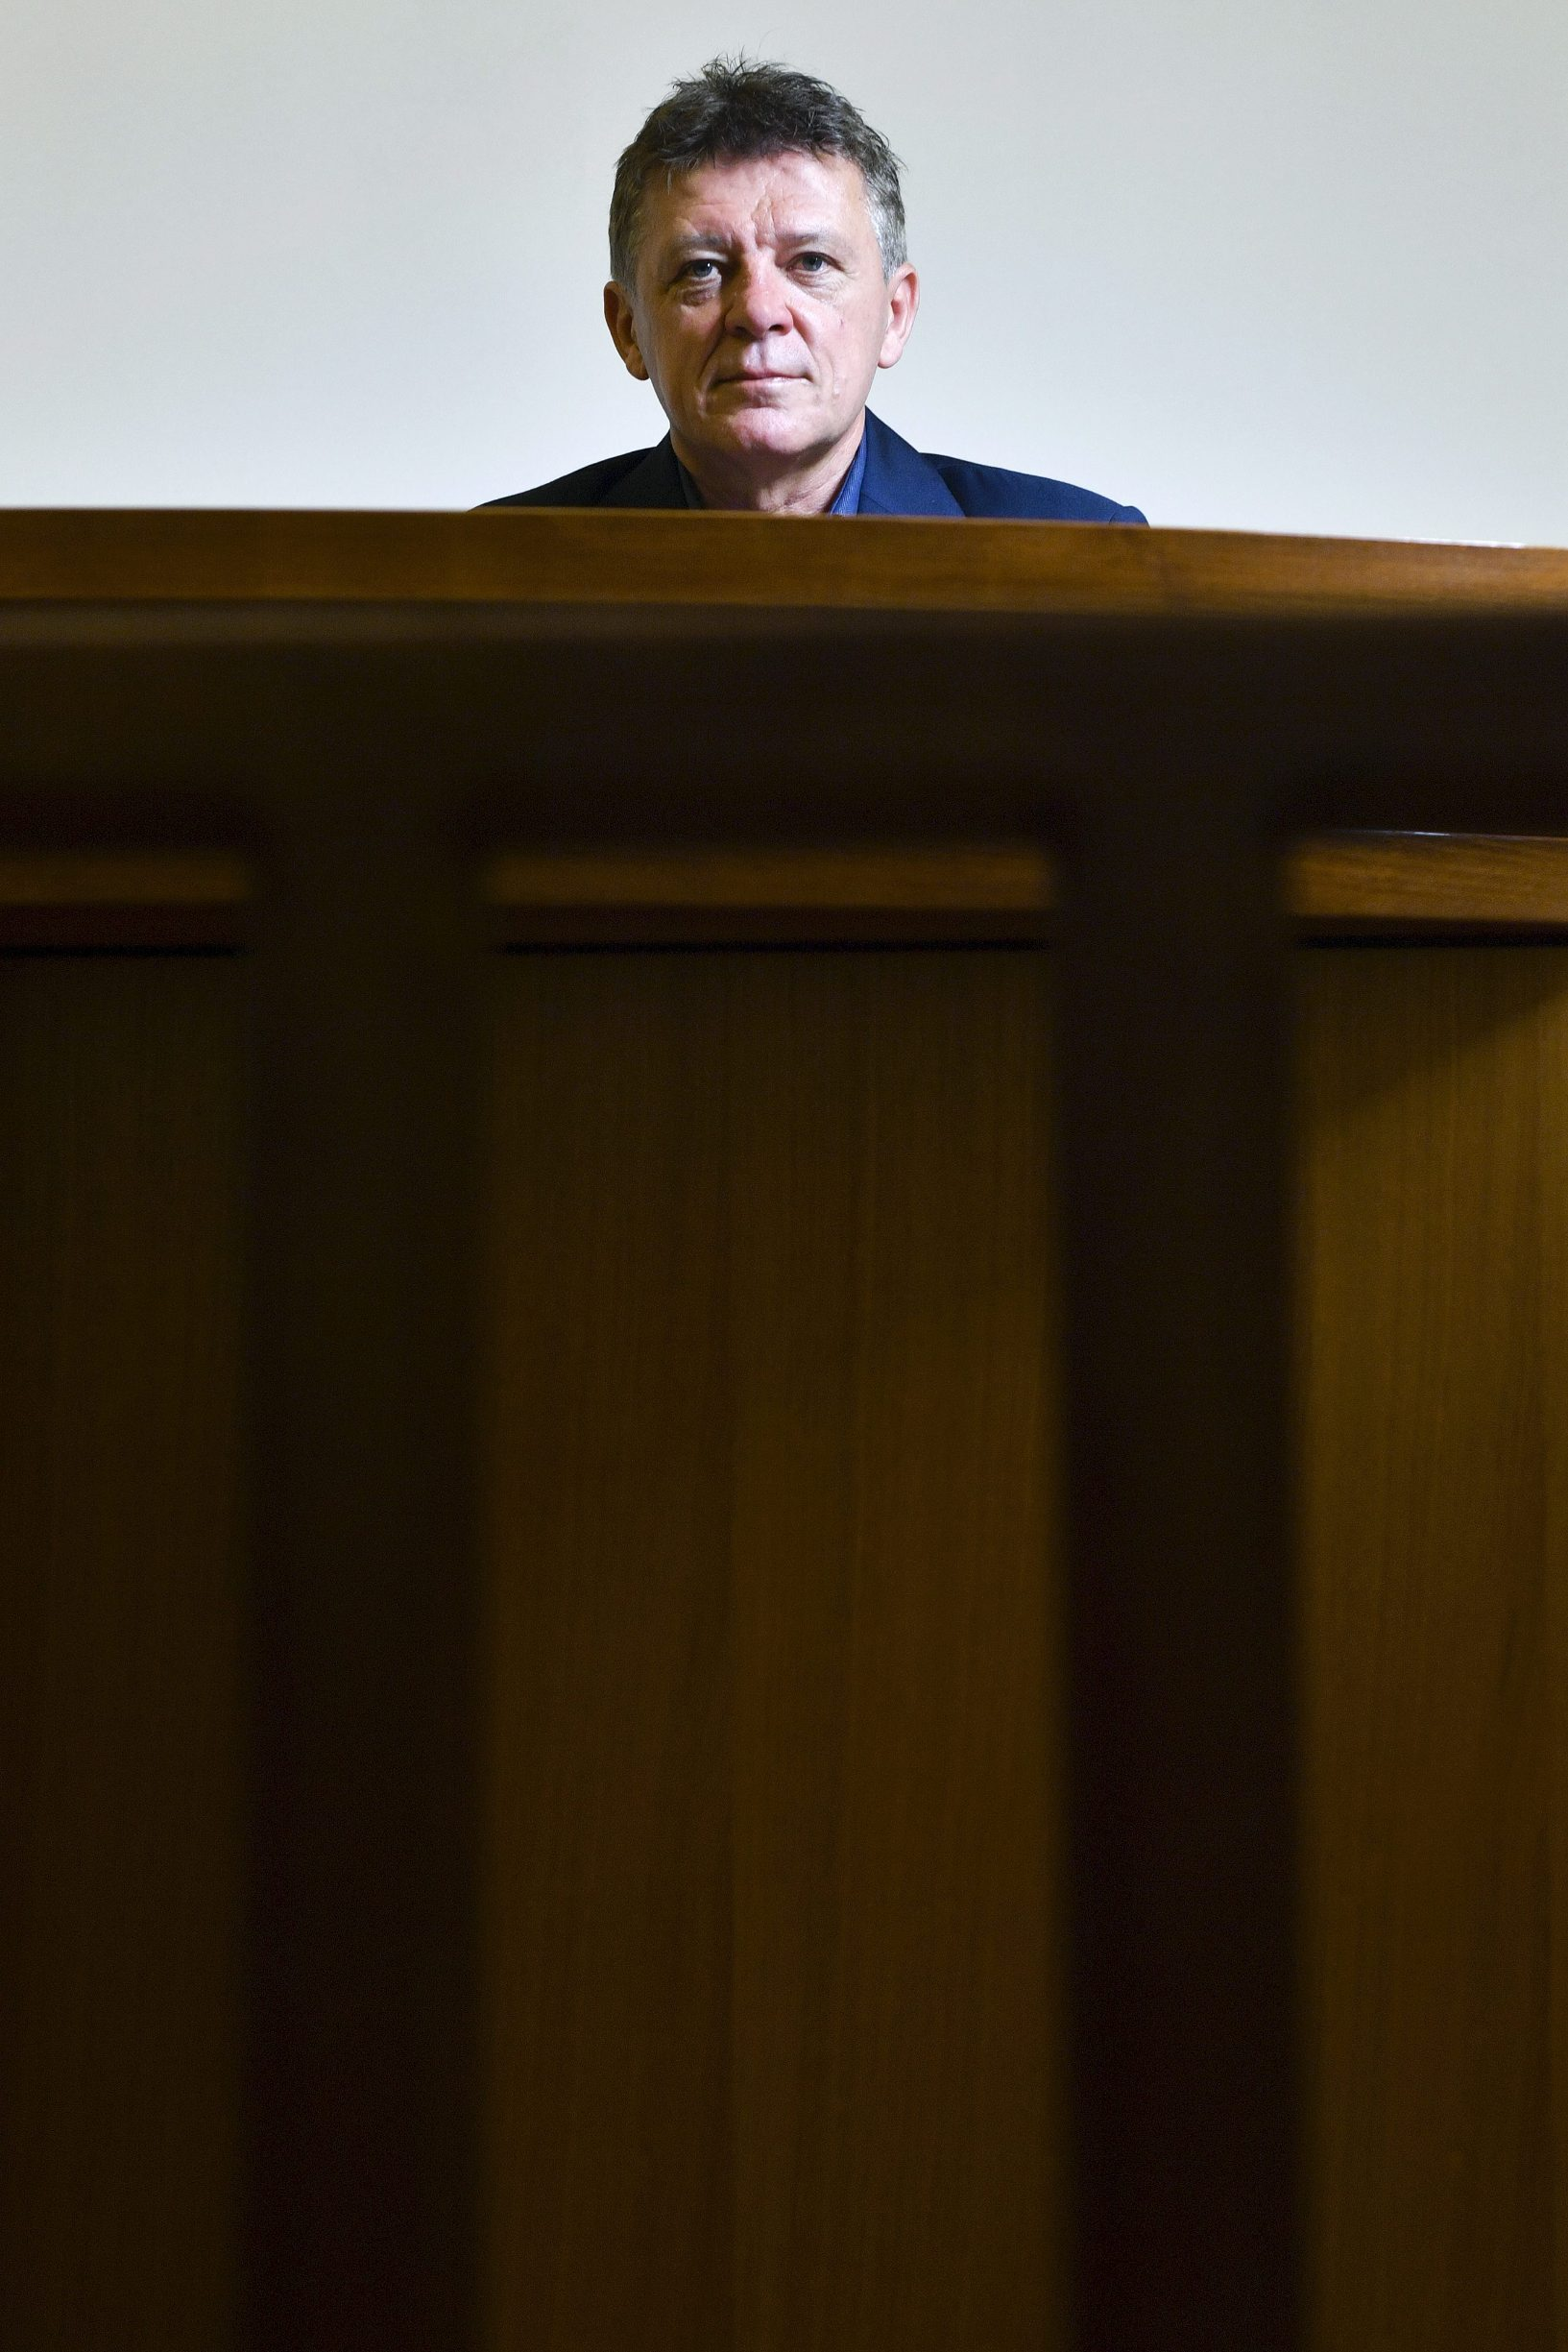 Zagreb, 050419. Sudac Ivan Turudic, fotografiran na Zupanijskom sudu. Foto: Boris Kovacev / CROPIX